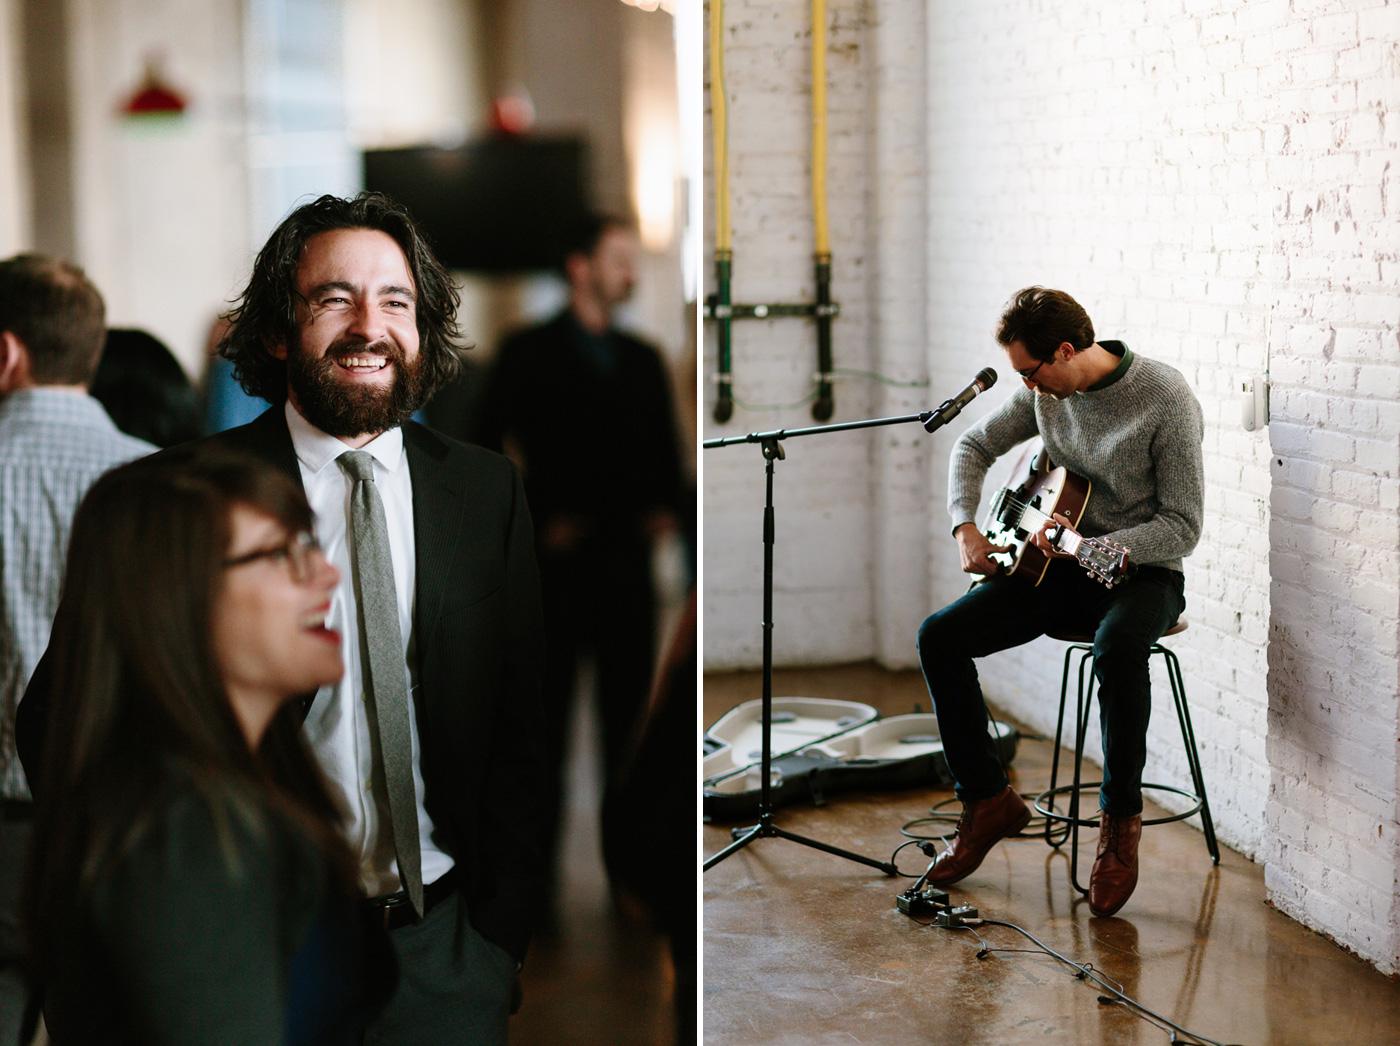 Studios-at-Overland-Crossing-Wedding-Photographer-00030.jpg